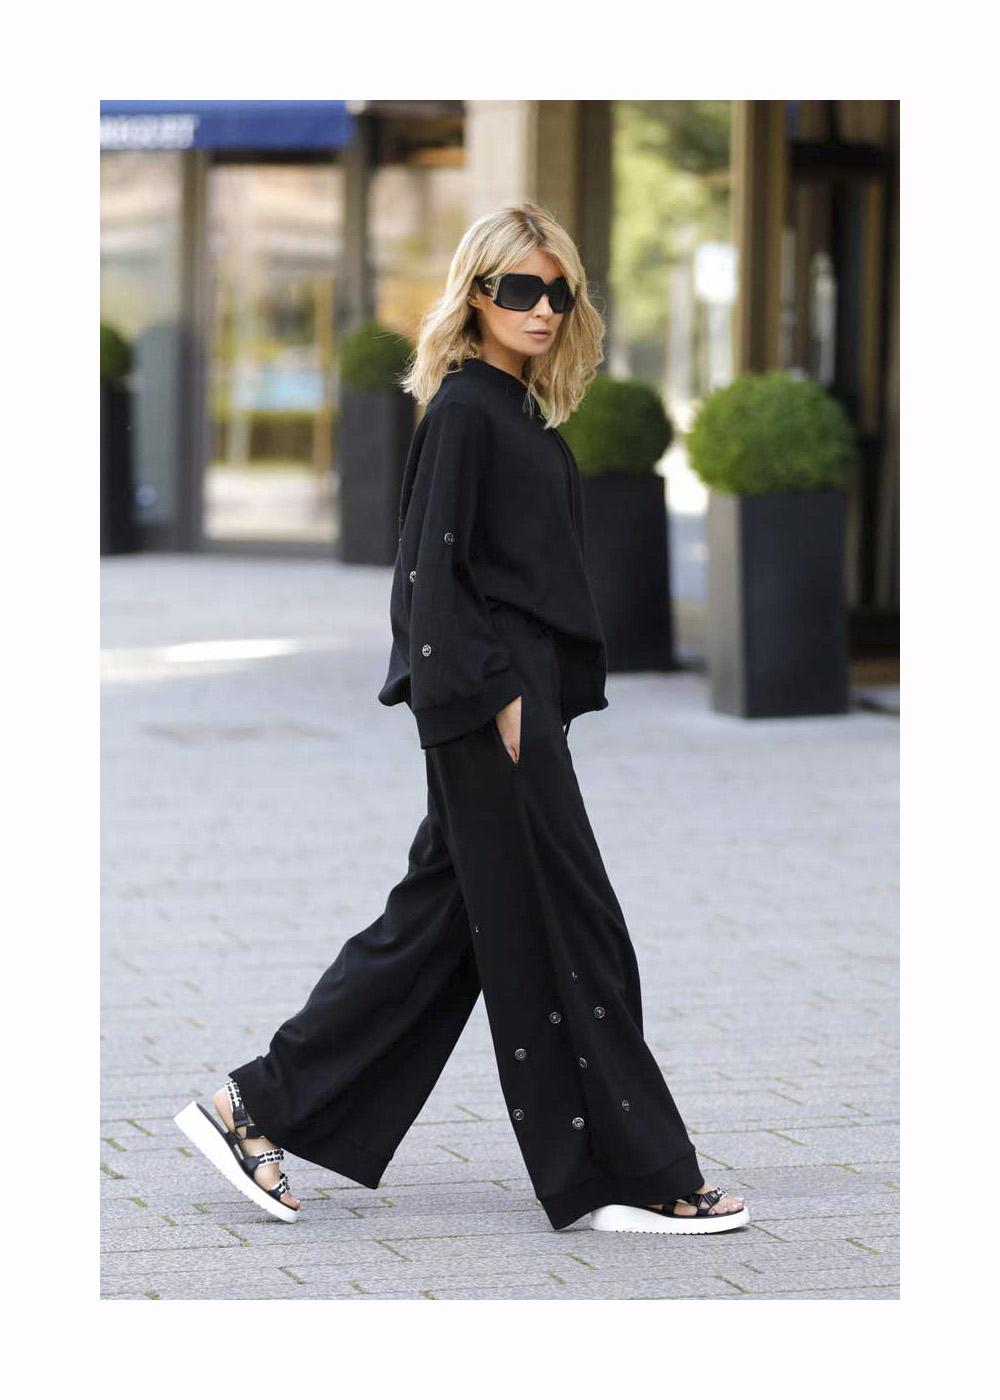 Street Style – Duesseldorf – May 17, 2020